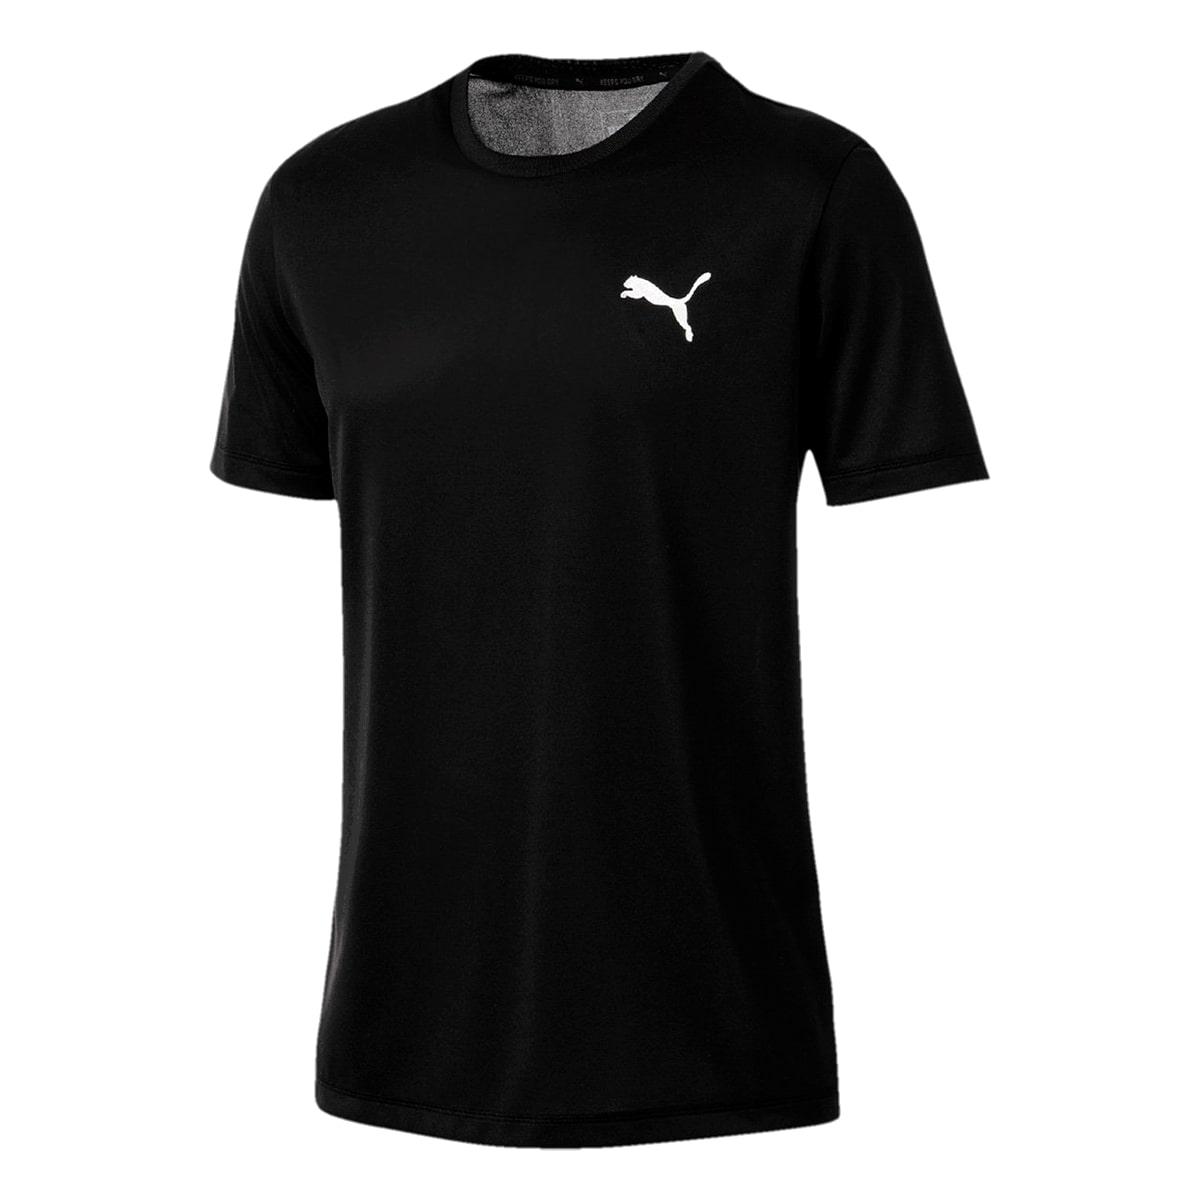 Camiseta Puma Active Masculino Preto